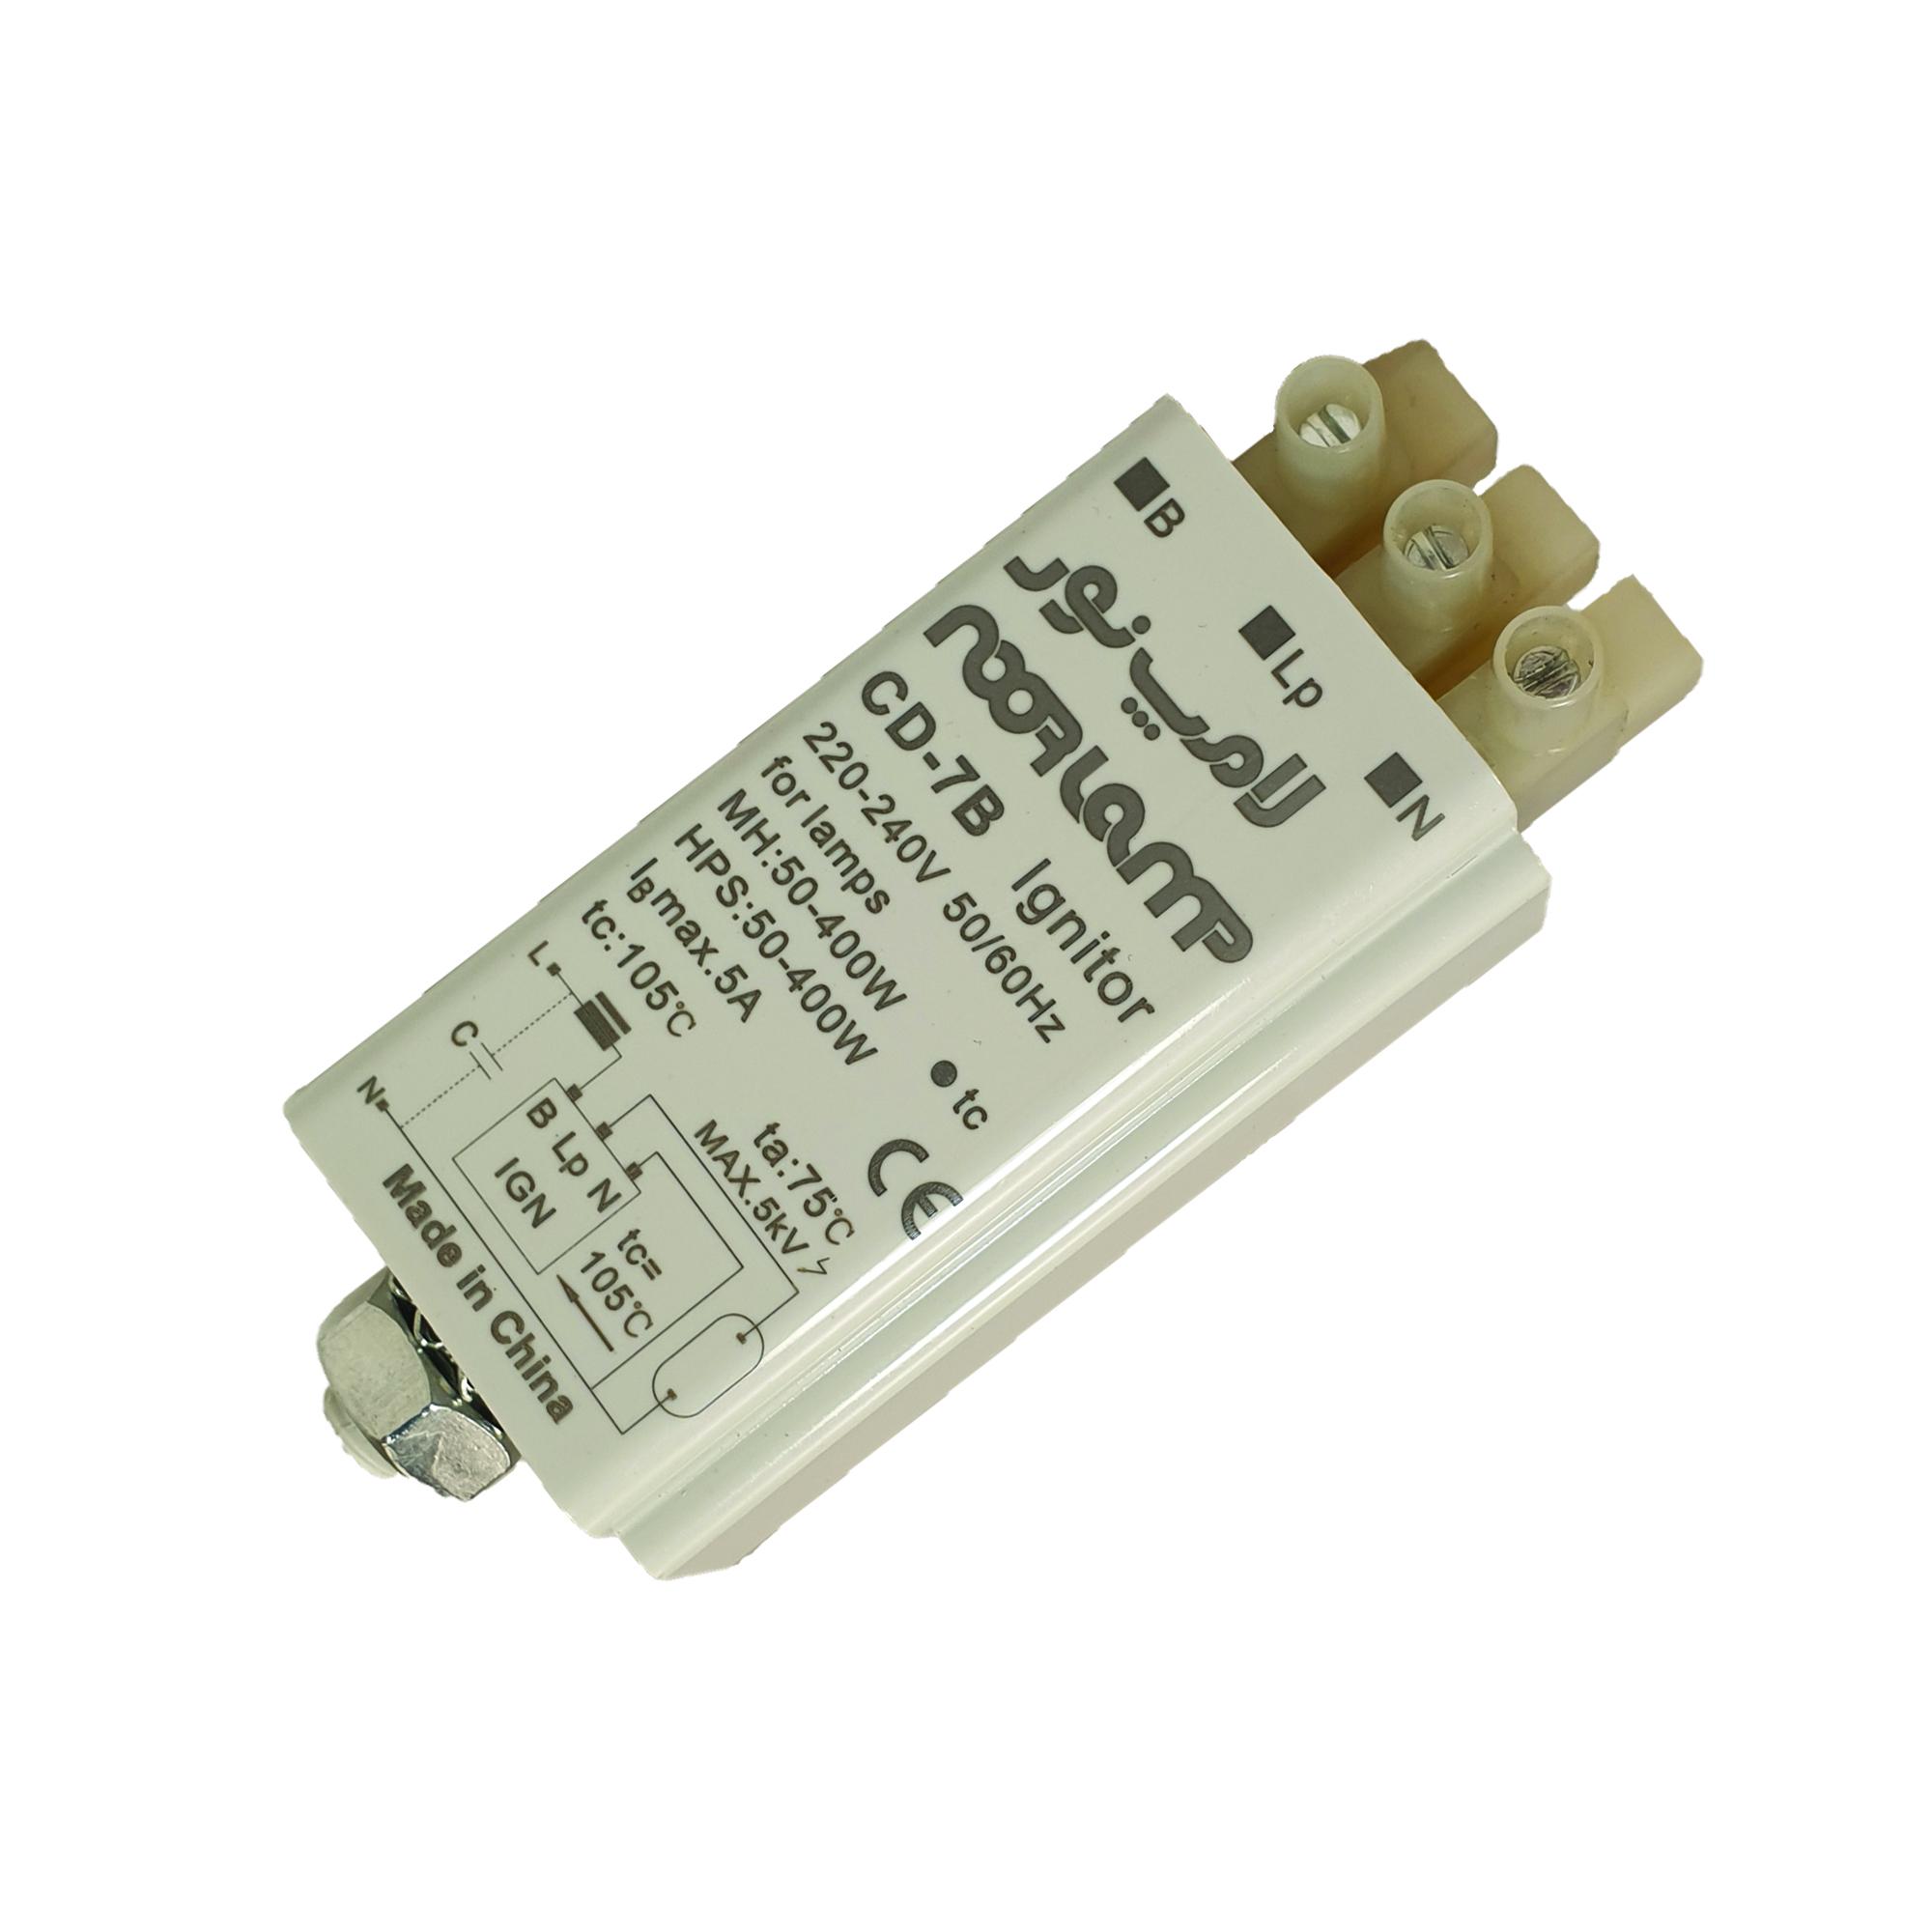 استارتر لامپ نور مدل CD - 7b ignitor